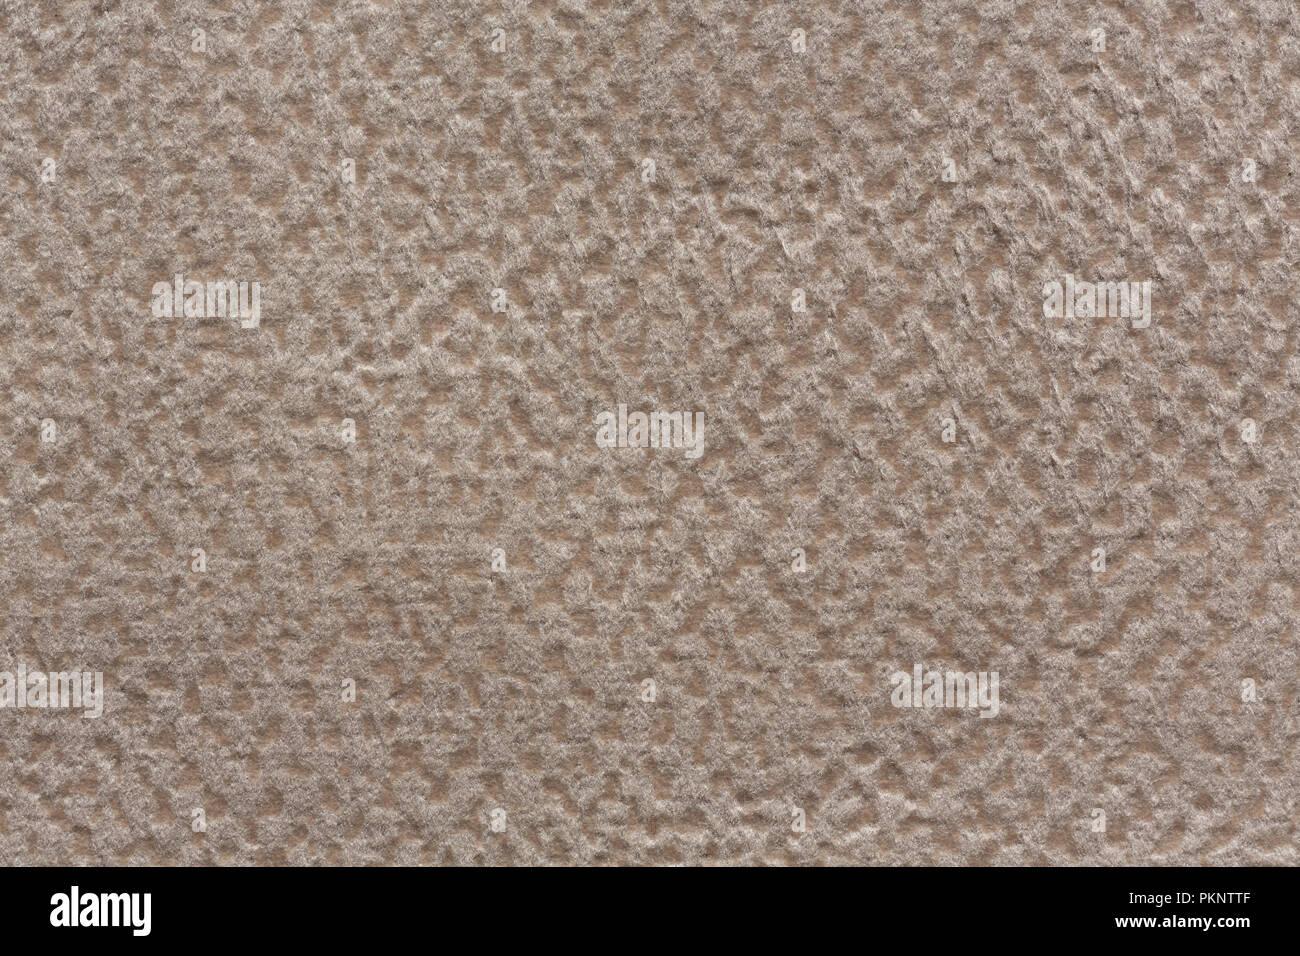 Elegant Light Fabric Texture High Resolution Photo Stock Photo